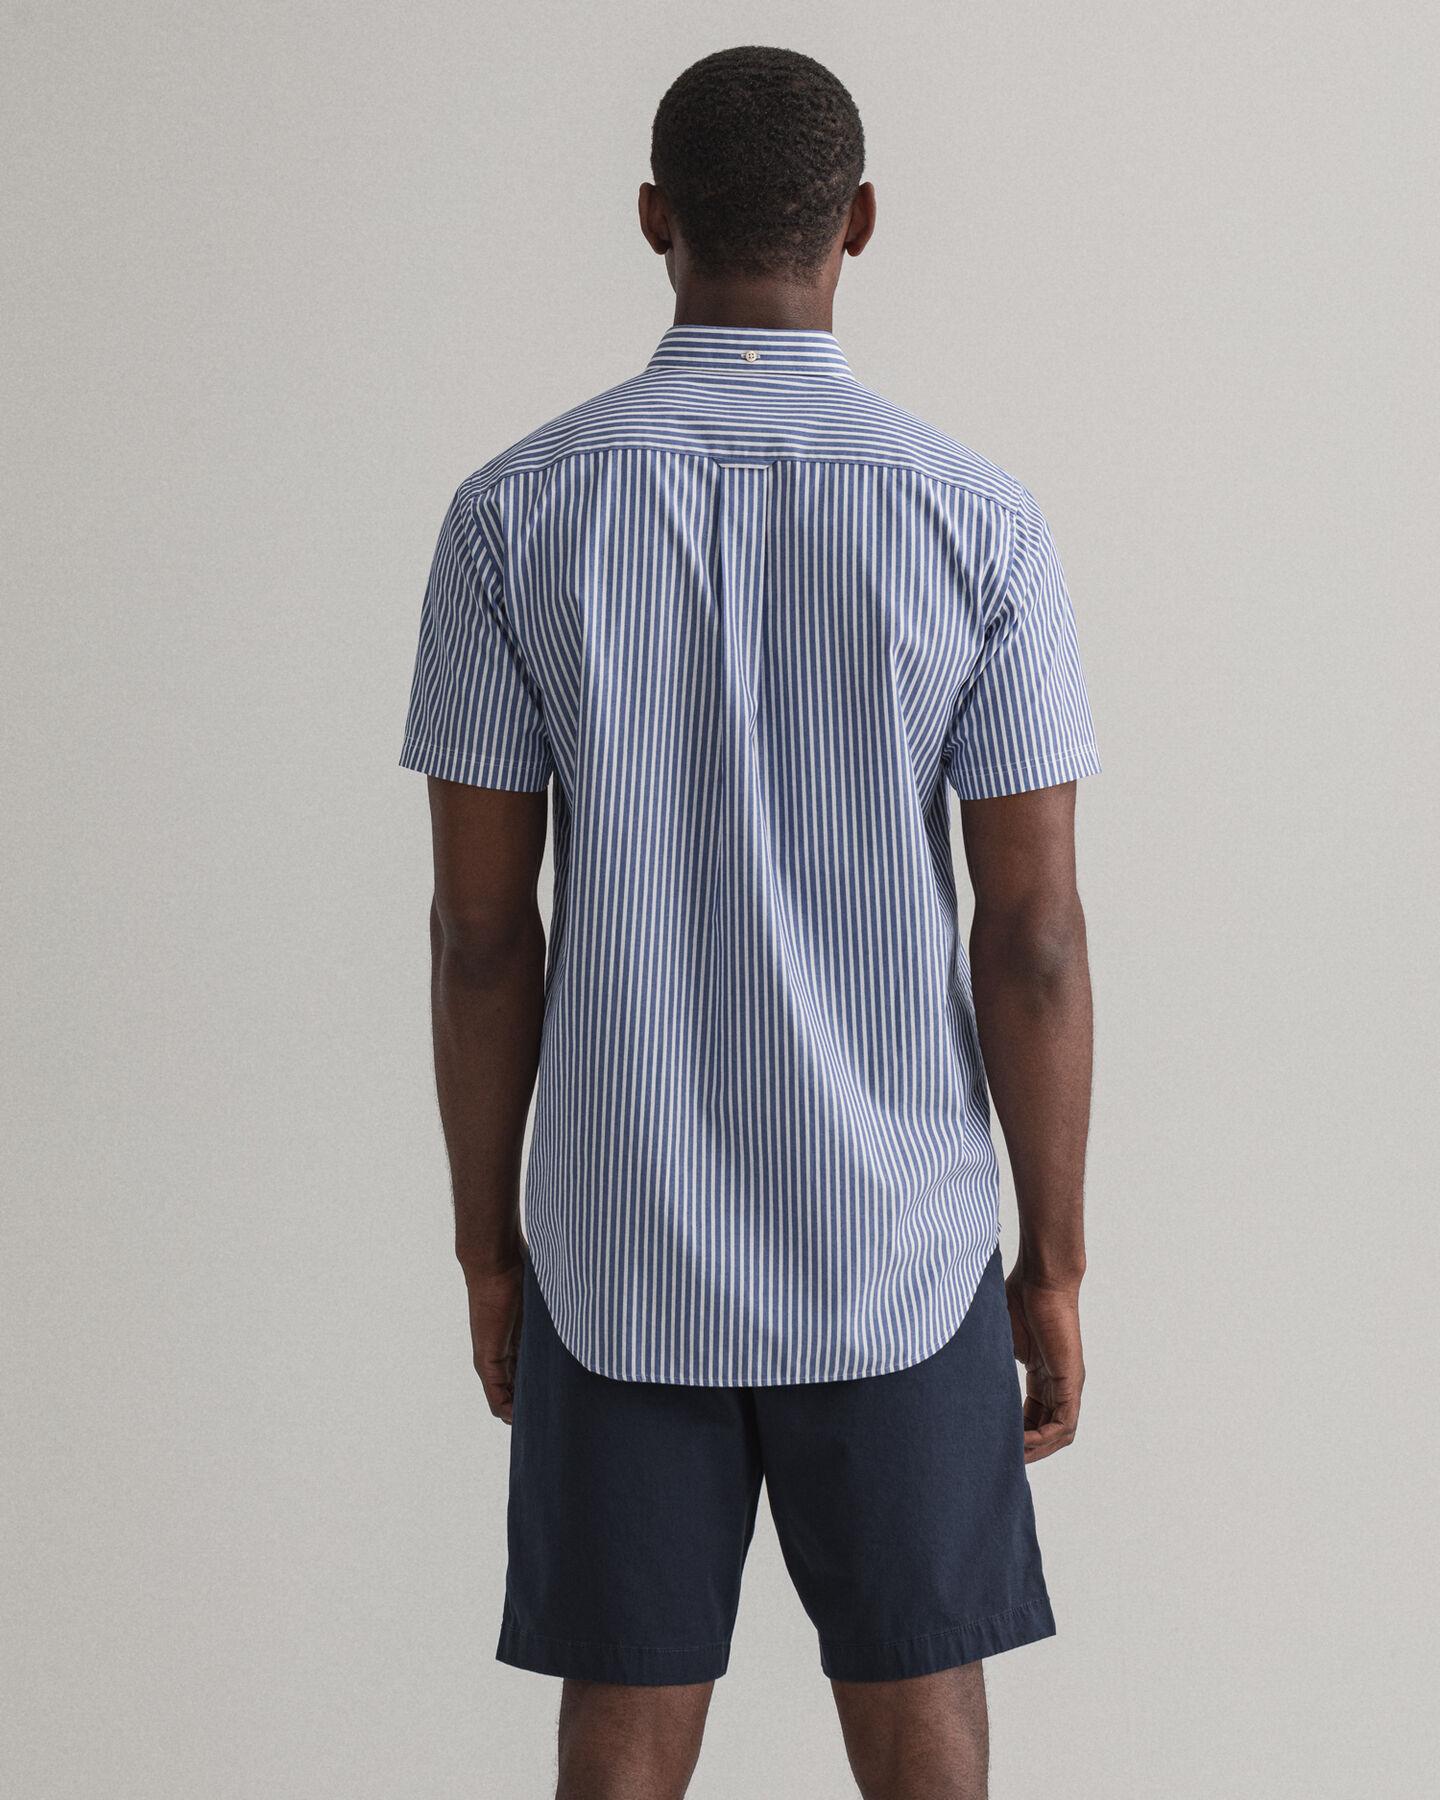 Regular Fit Broadcloth Kurzarm Hemd mit Streifen